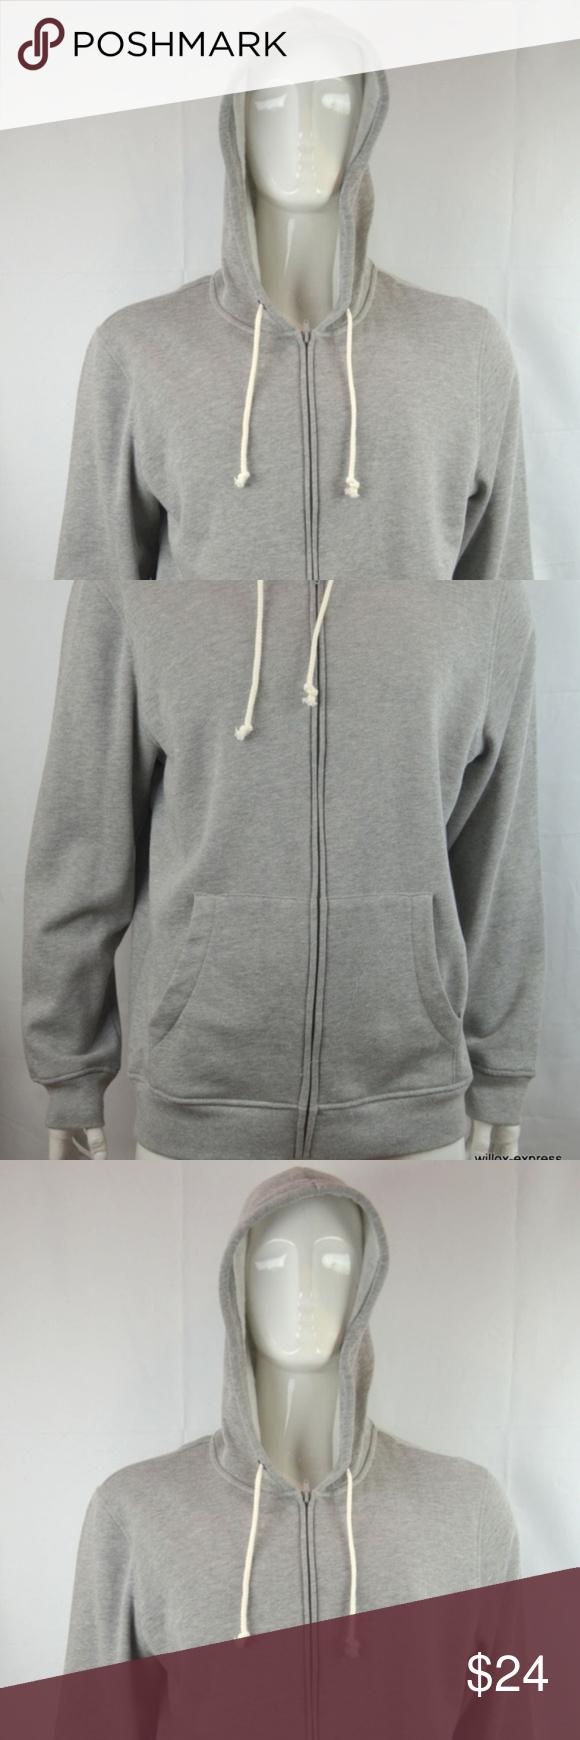 American rag fleece hoodie menus xl gray heather nwt my posh